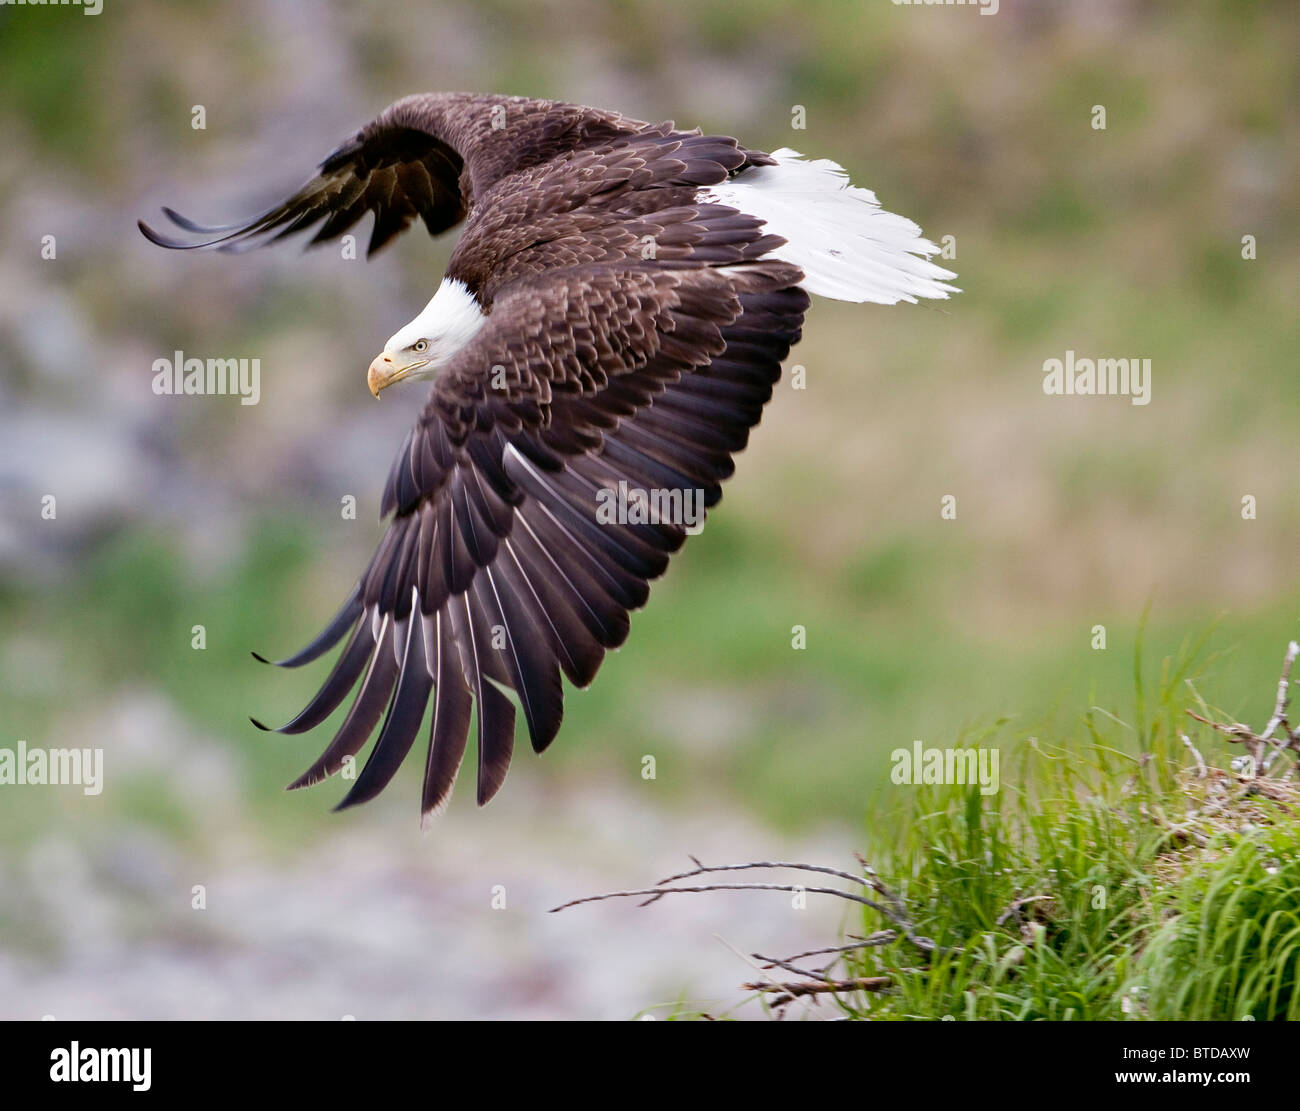 An female eagle flys protectively over her nest high in the rocks near Kukak Bay, Katmai National Park, Southwest - Stock Image